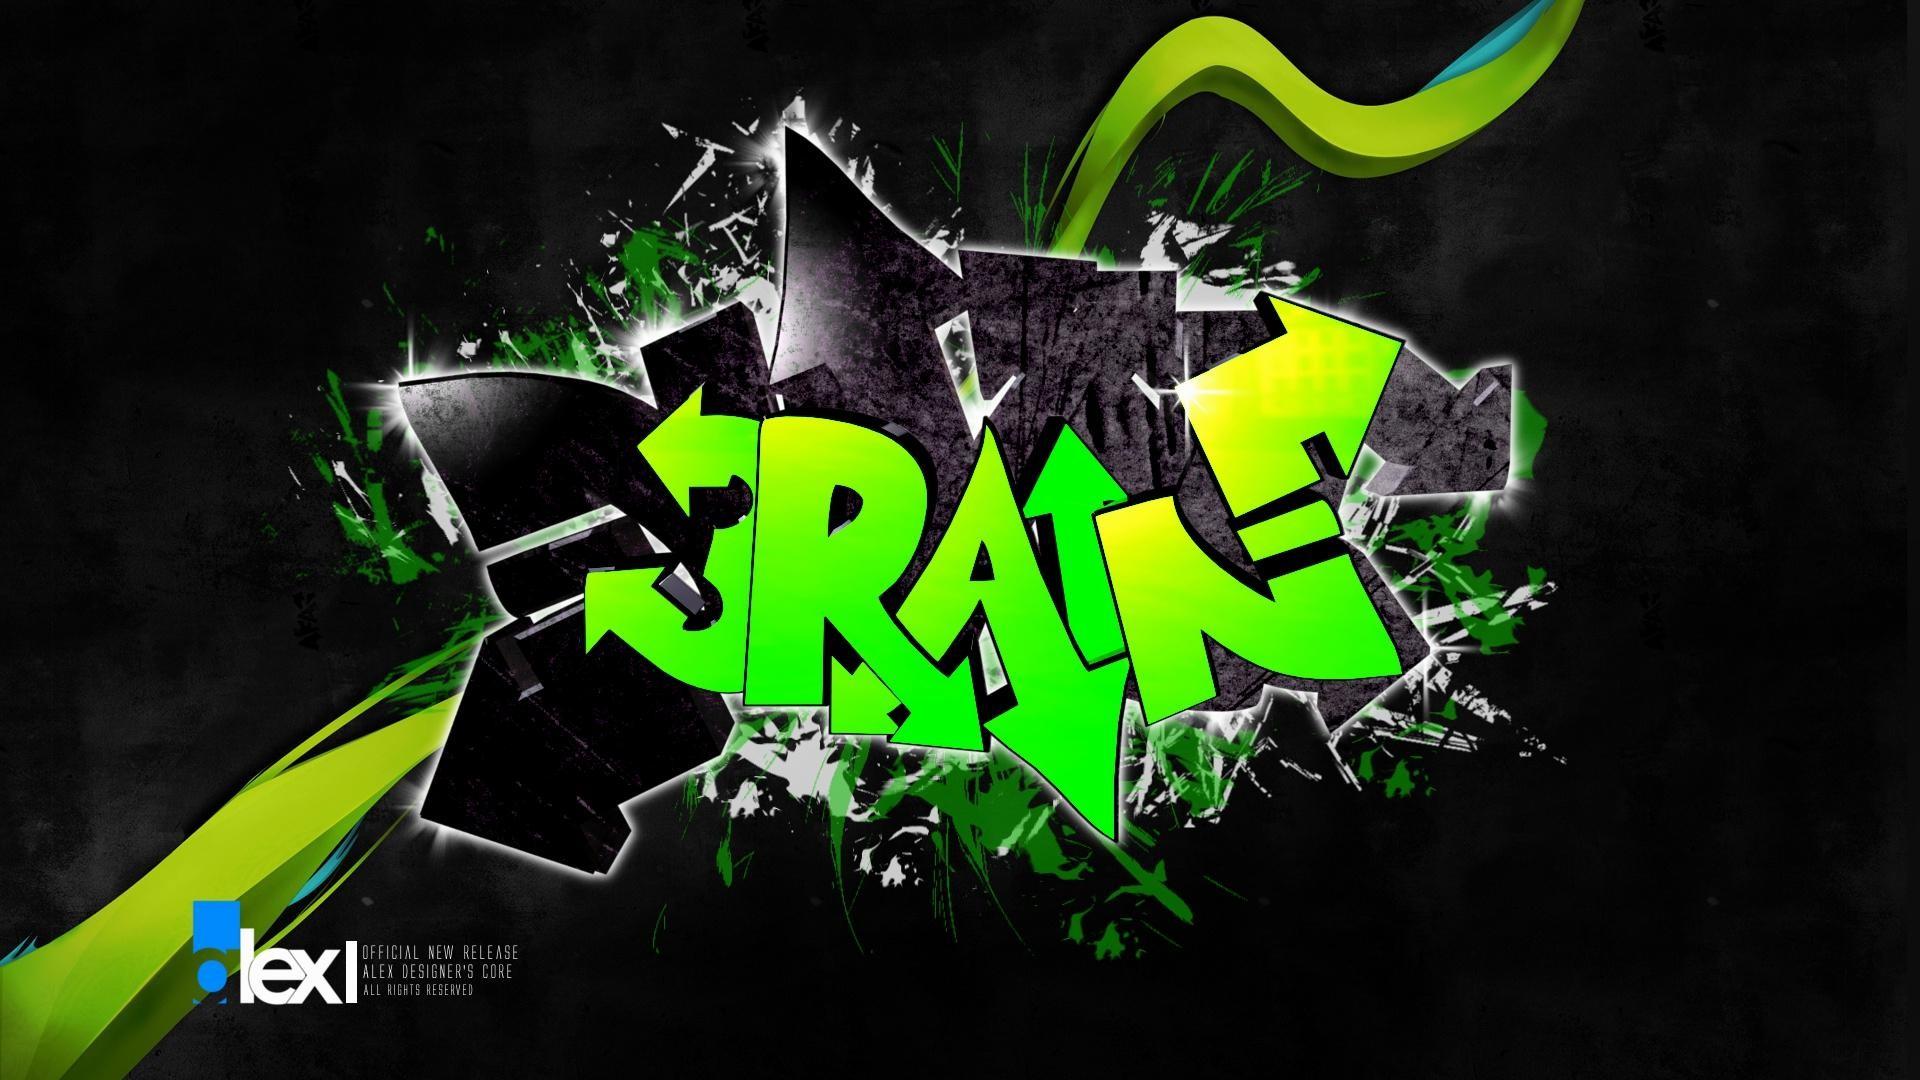 wallpaper.wiki-Cool-Graffiti-Backgrounds-HD-PIC-WPD0010476